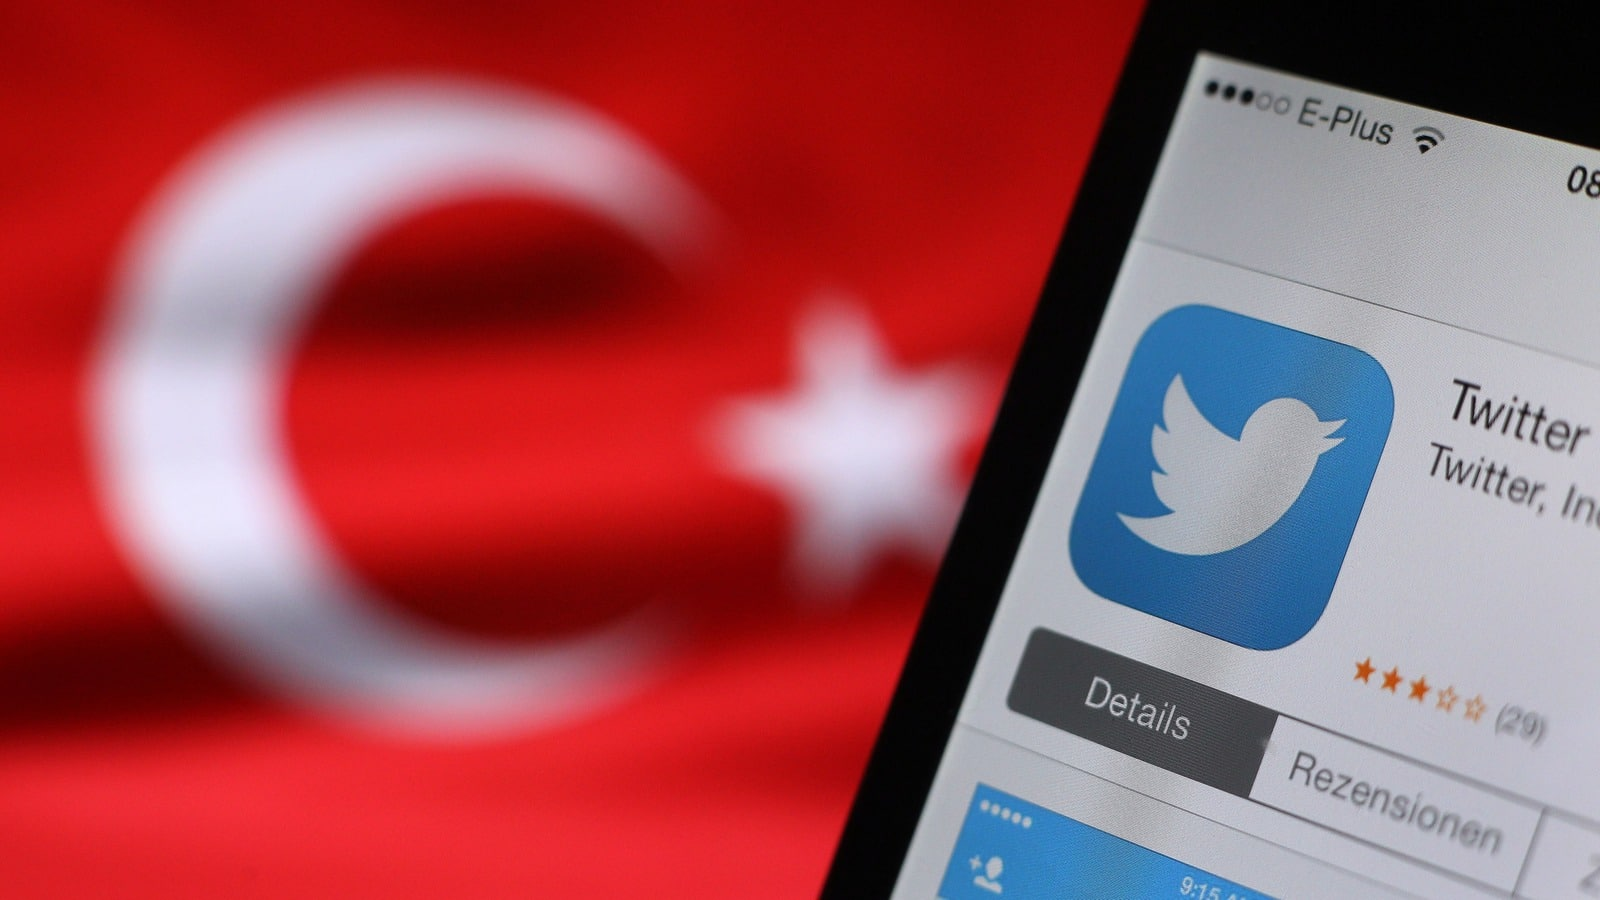 Turkey begins advertising ban on Twitter, bandwidth reduction to follow